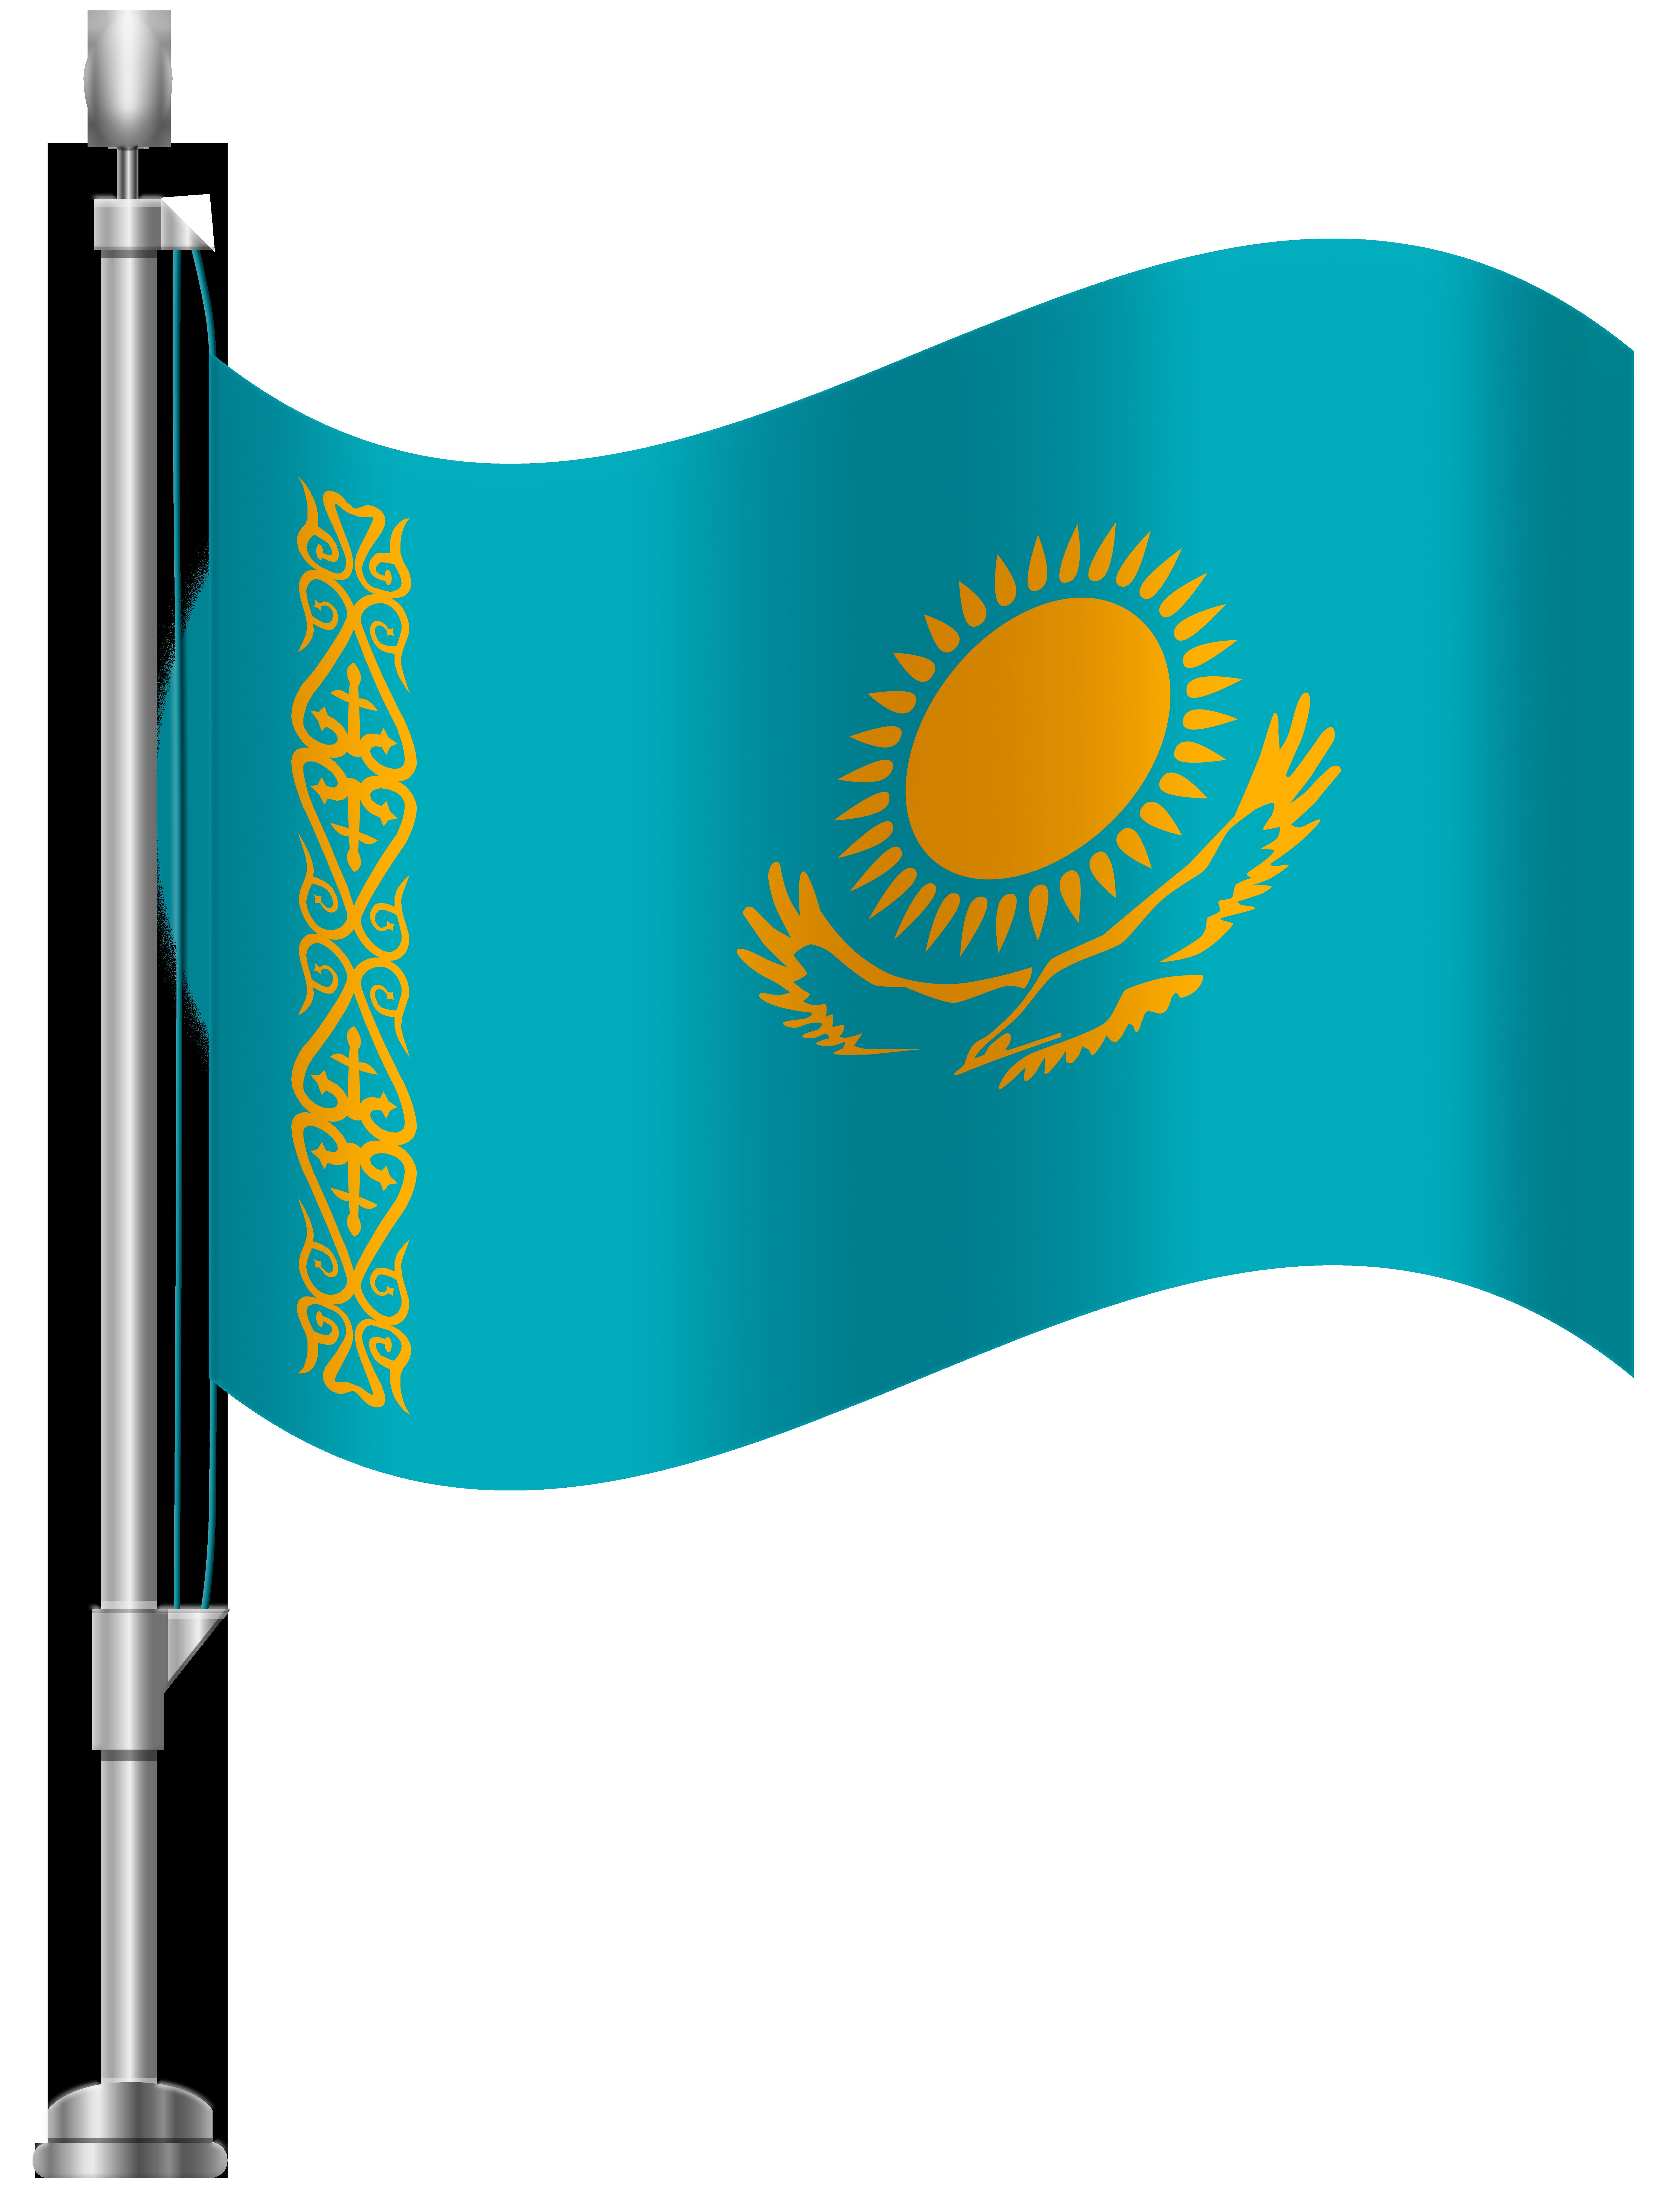 Kazakhstan clipart #2, Download drawings